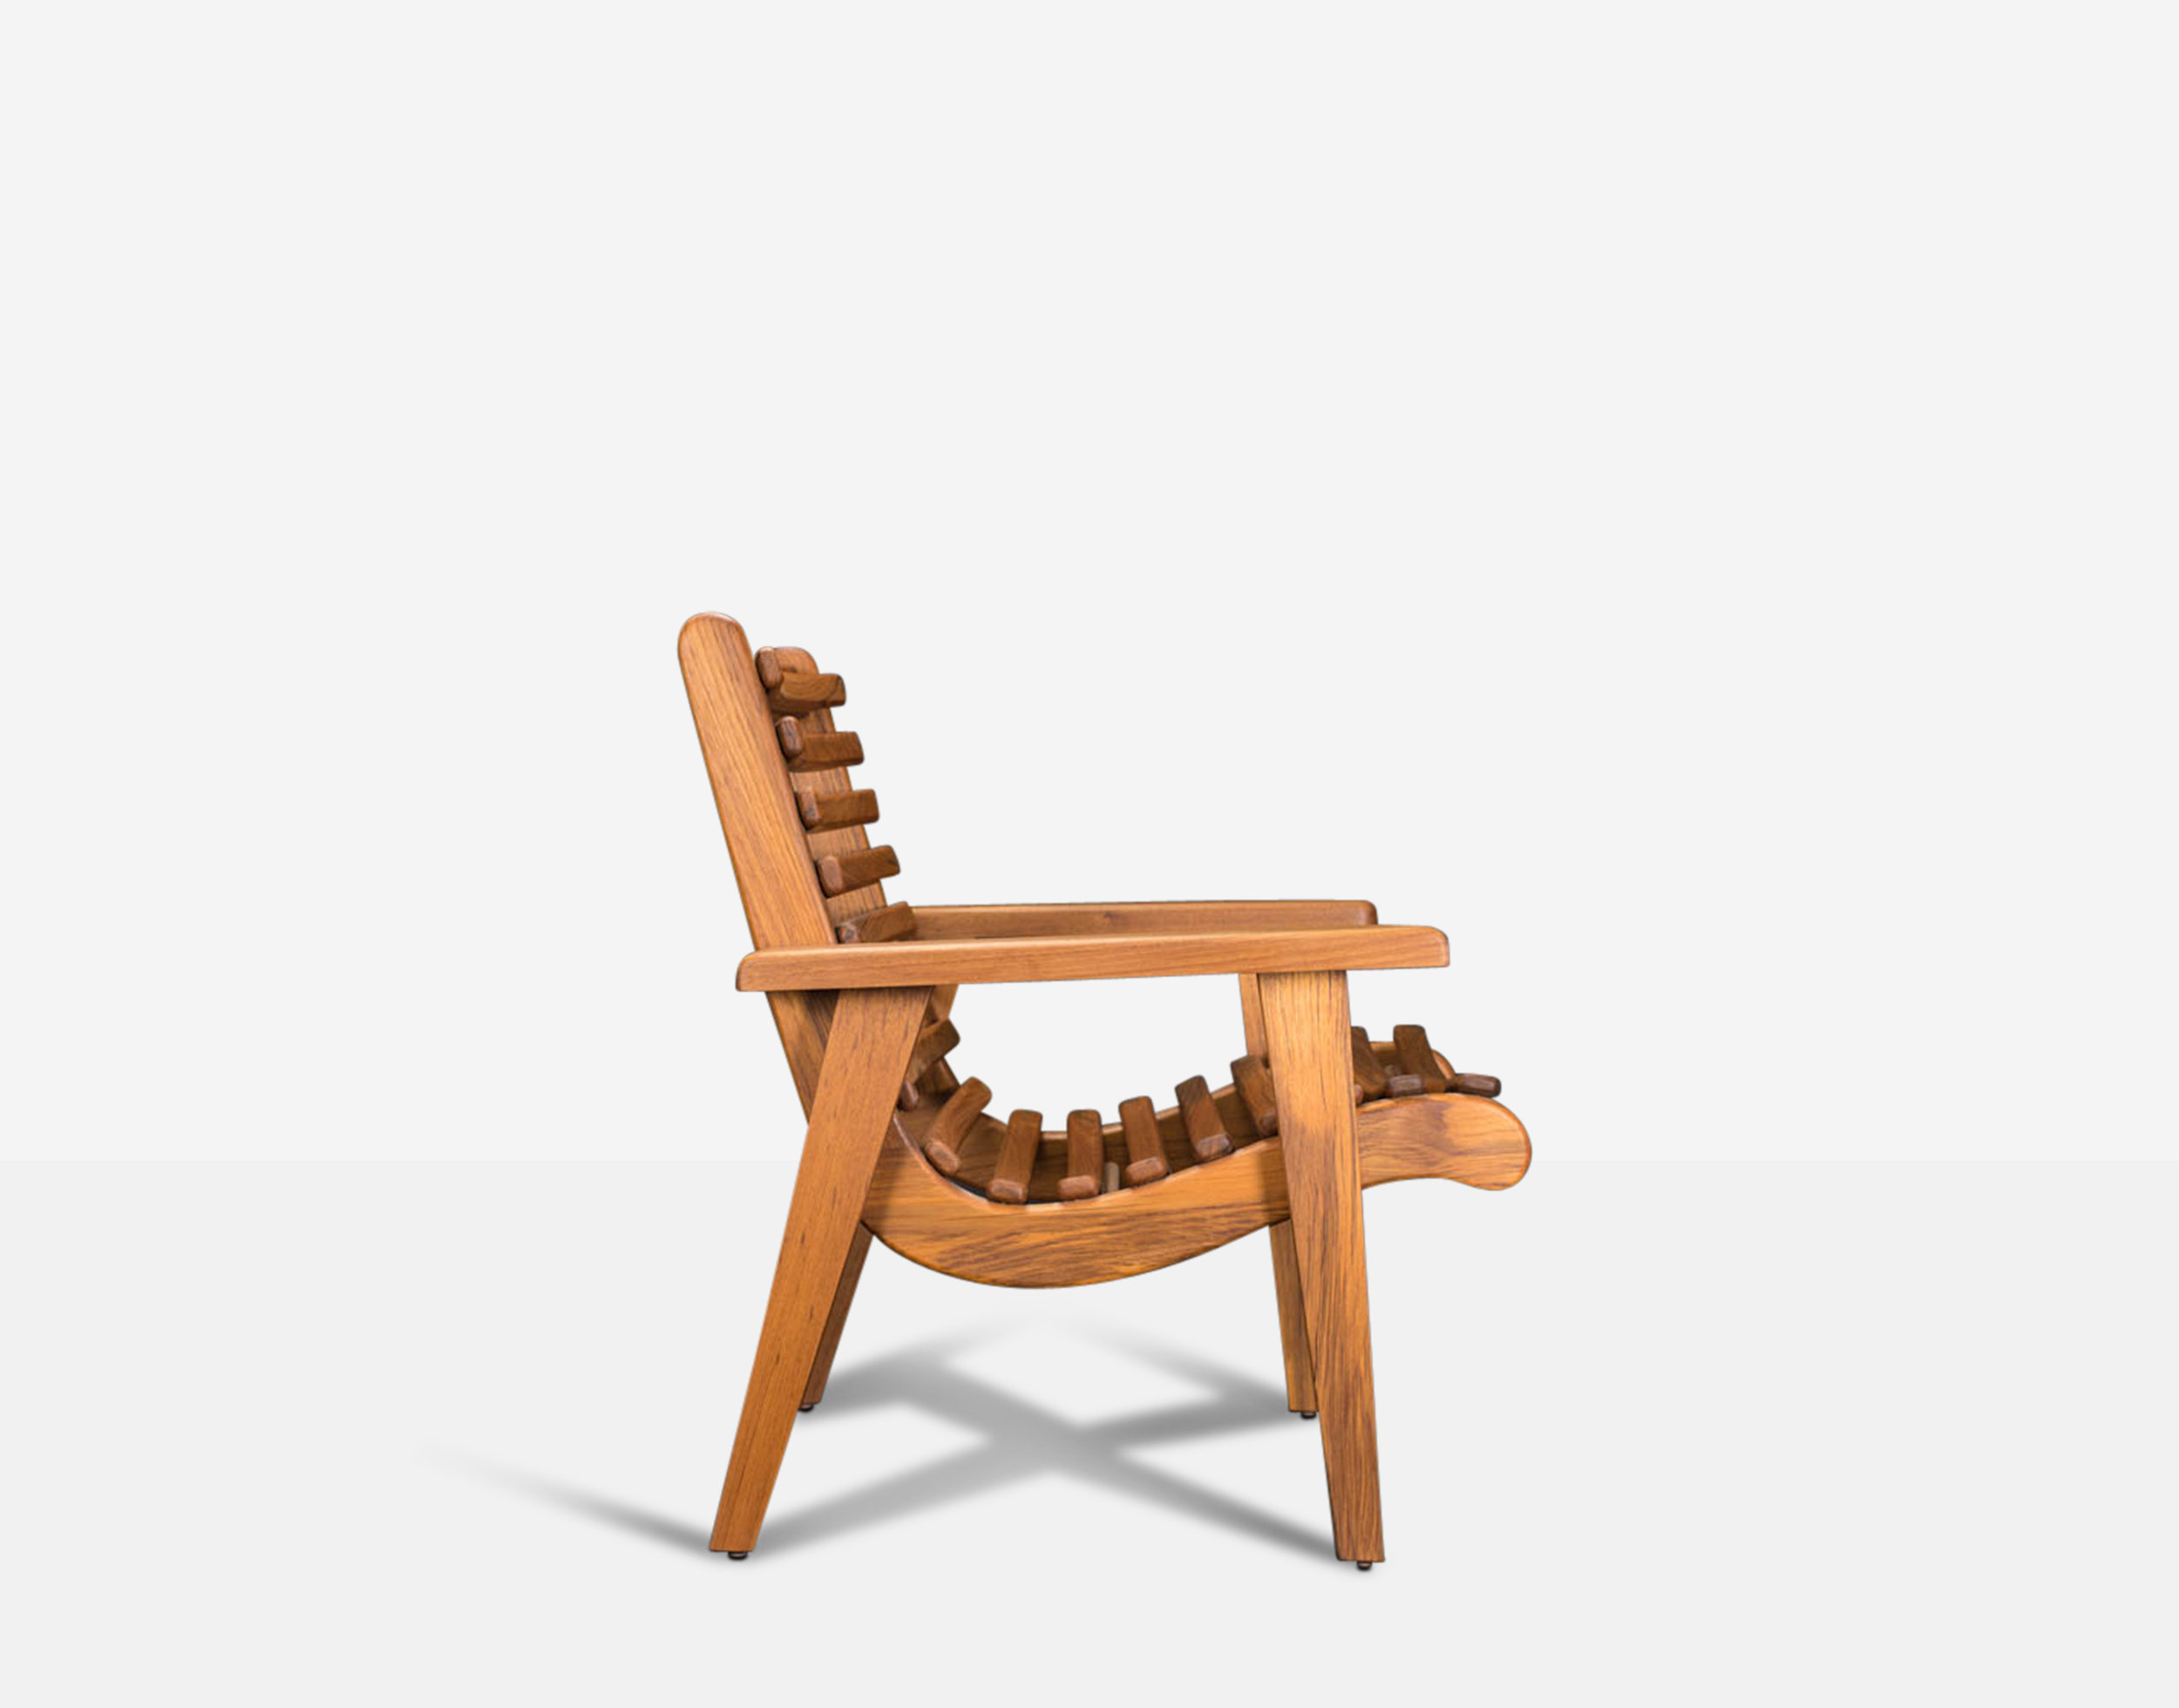 Luteca_MvB_San Miguelito-Armchair_Teak_S-W.jpg